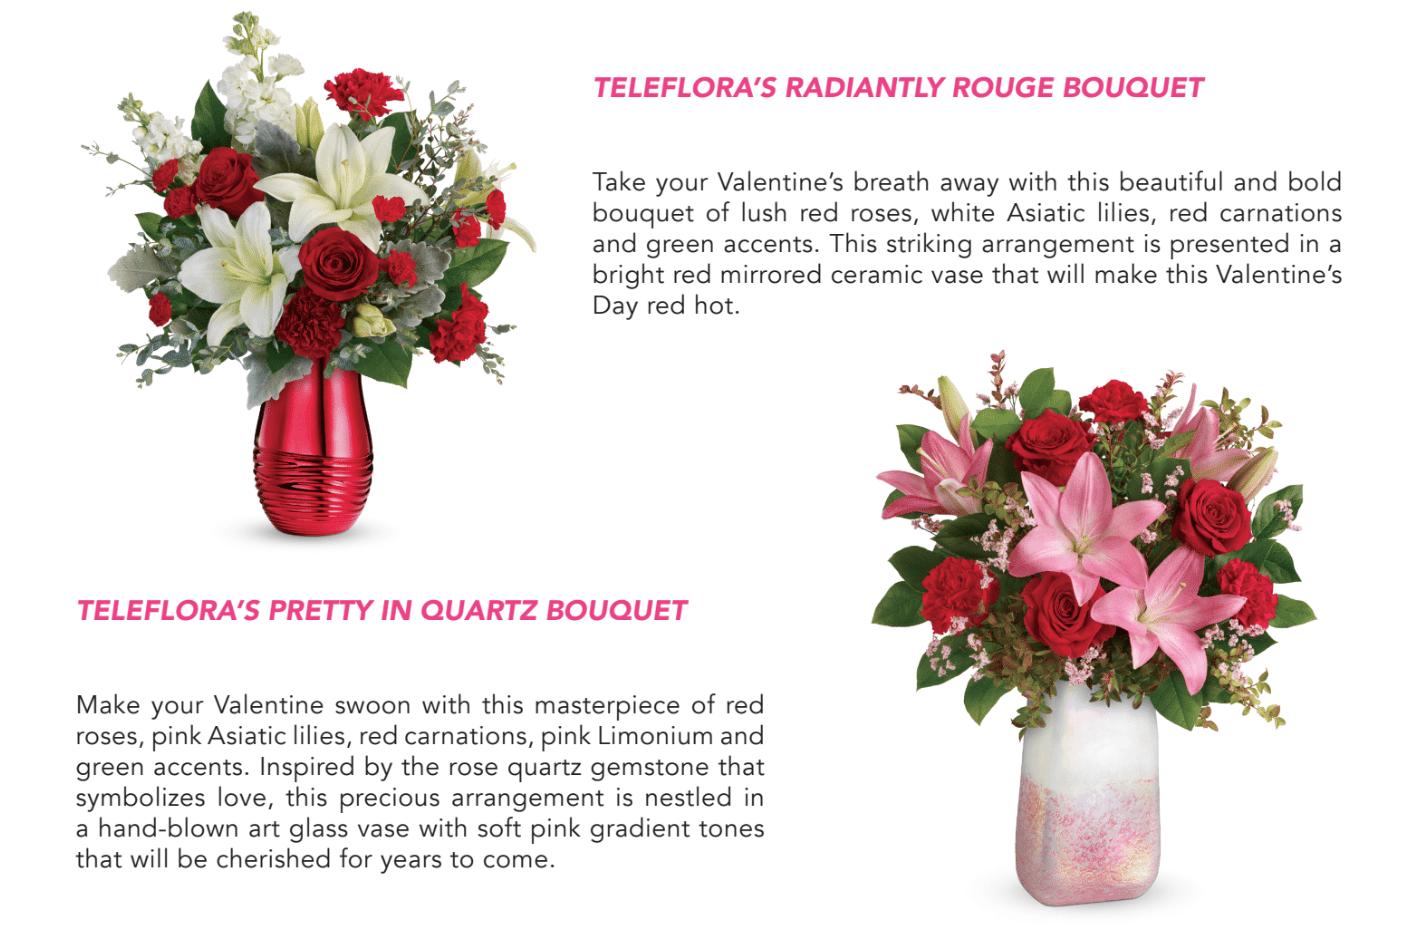 Teleflora Valentine 2020 Bouquets